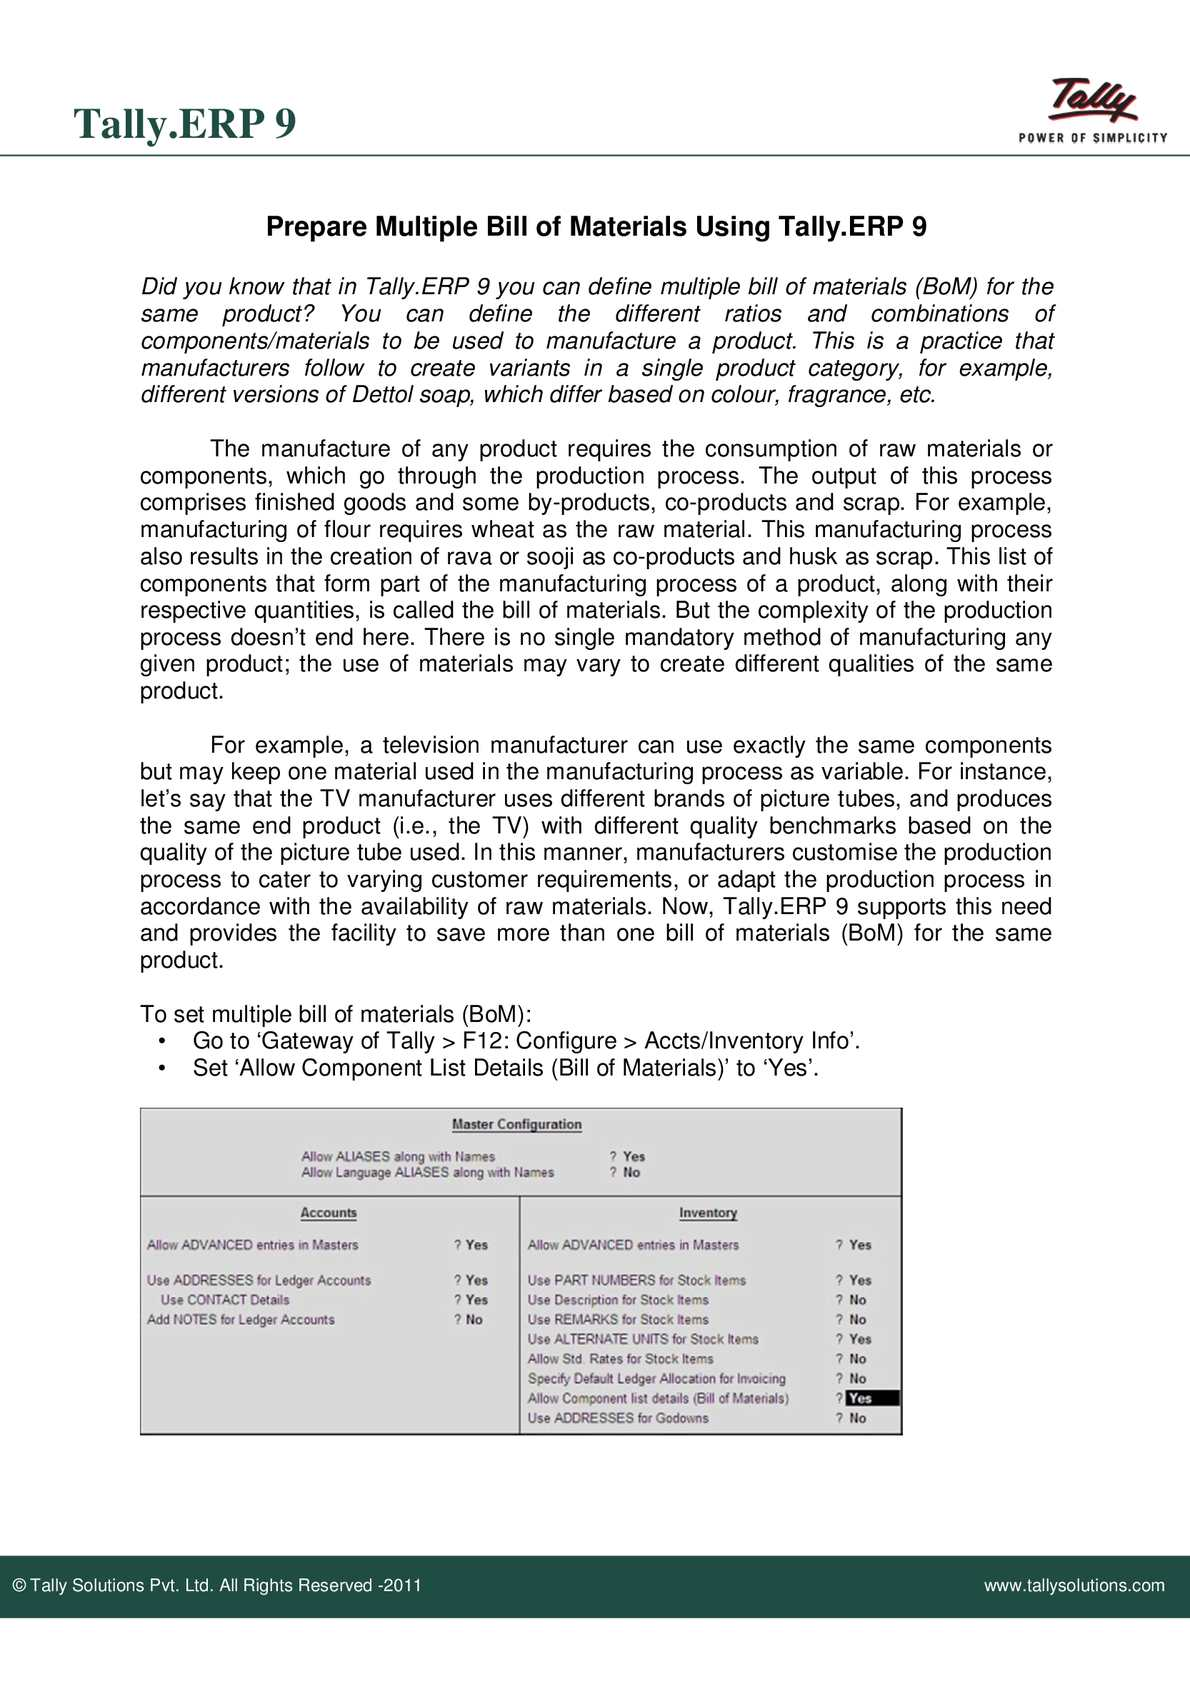 Calaméo - MultipleBillofMaterialsinTally ERP9 | Tally